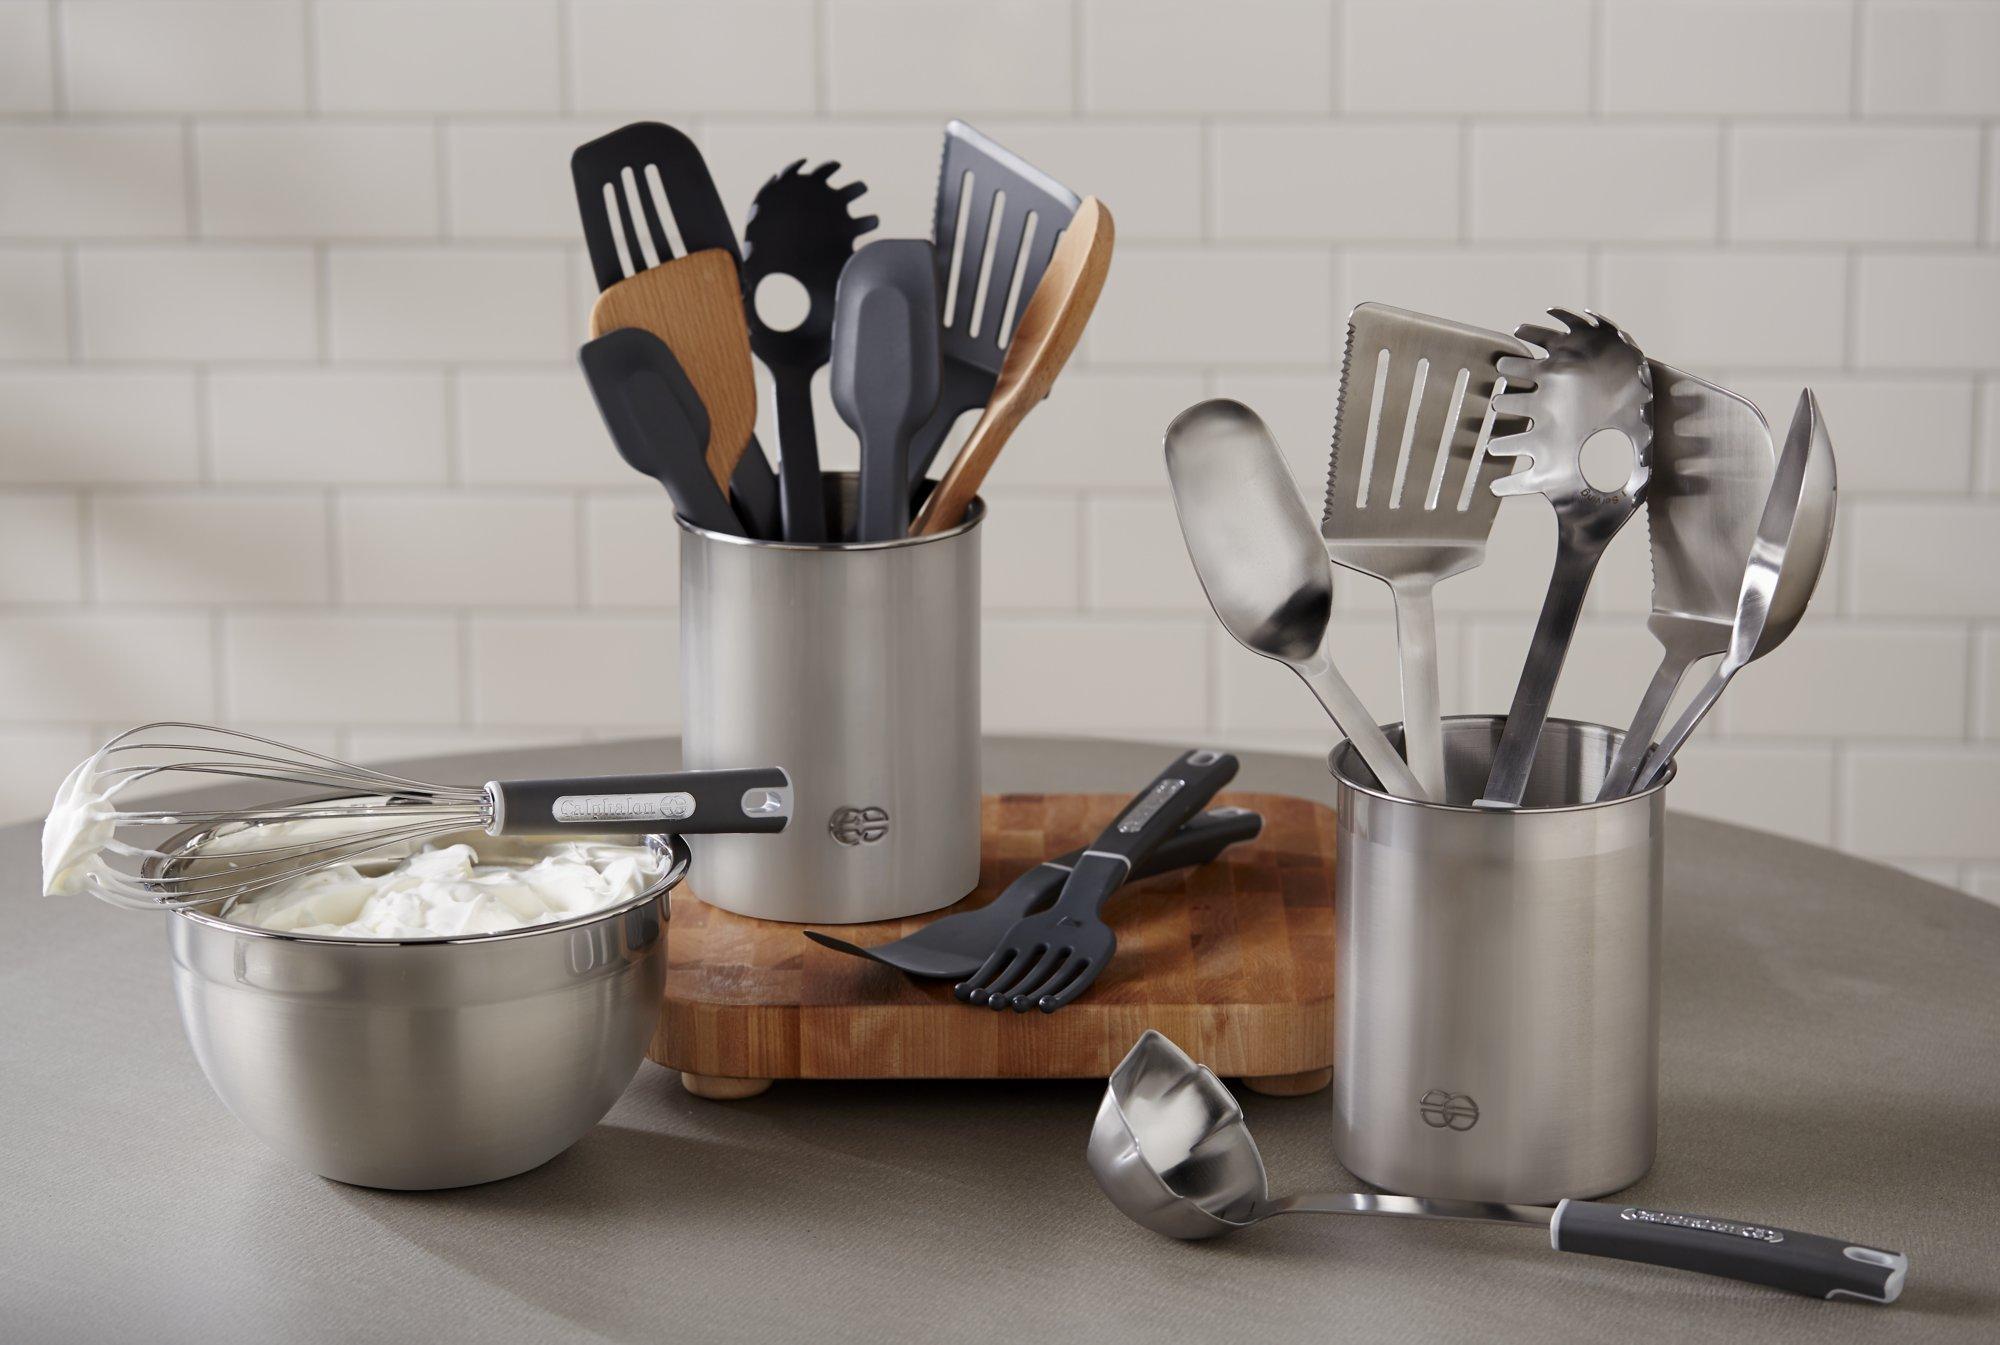 kitchen essentials by calphalon fingerhut cookware cutlery bakeware kitchenware and more